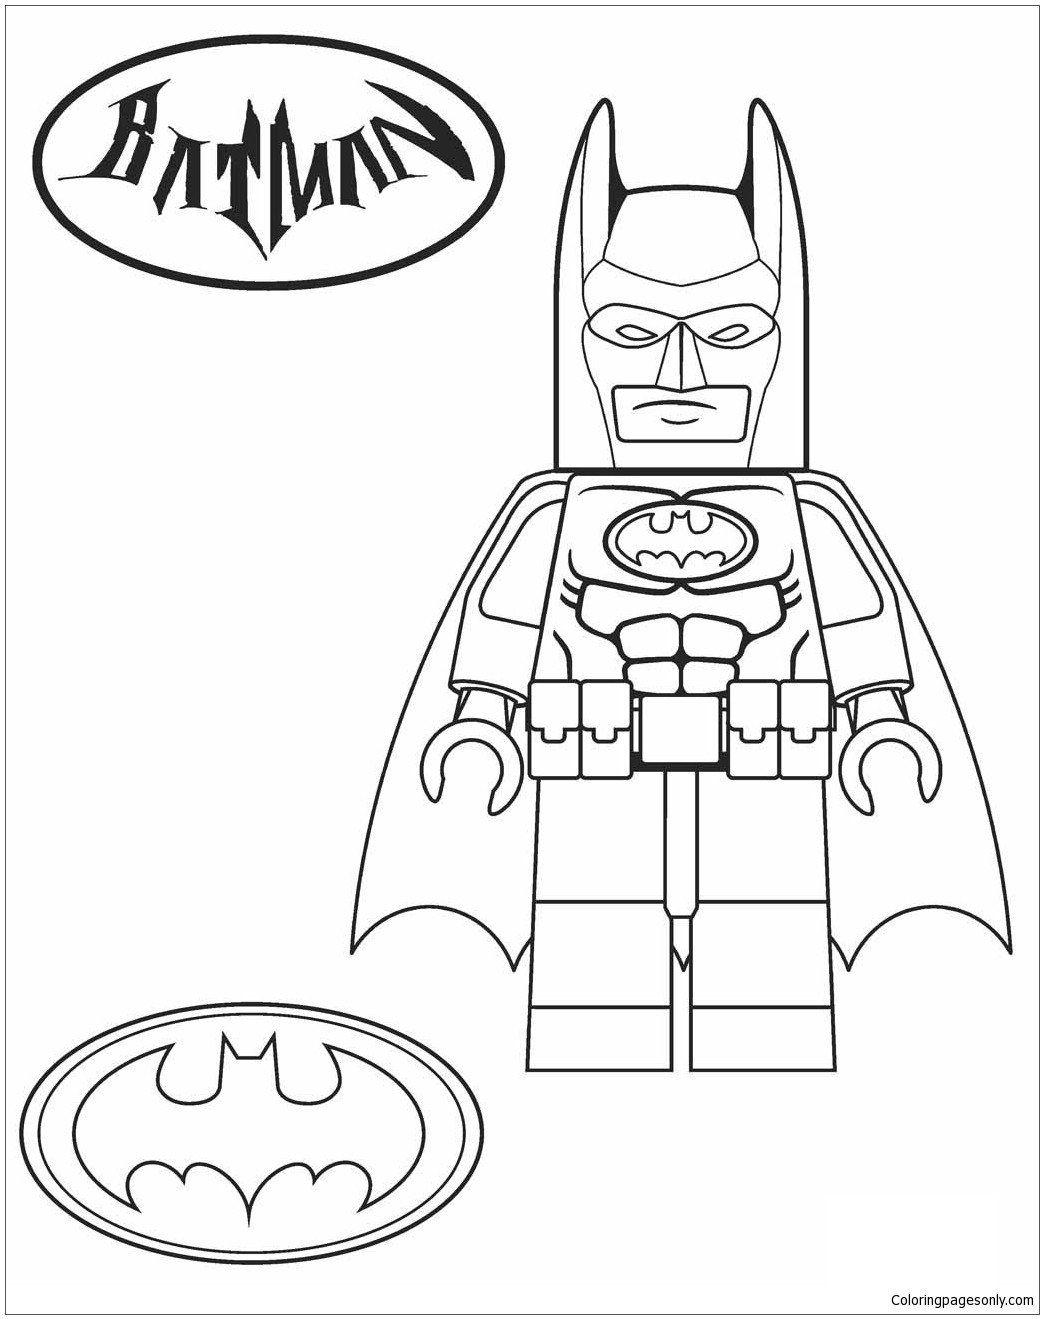 Lego Superhero Coloring Pages Lego Batman 7 Coloring Page Free Coloring Pages Line Lego Coloring Pages Lego Coloring Batman Coloring Pages